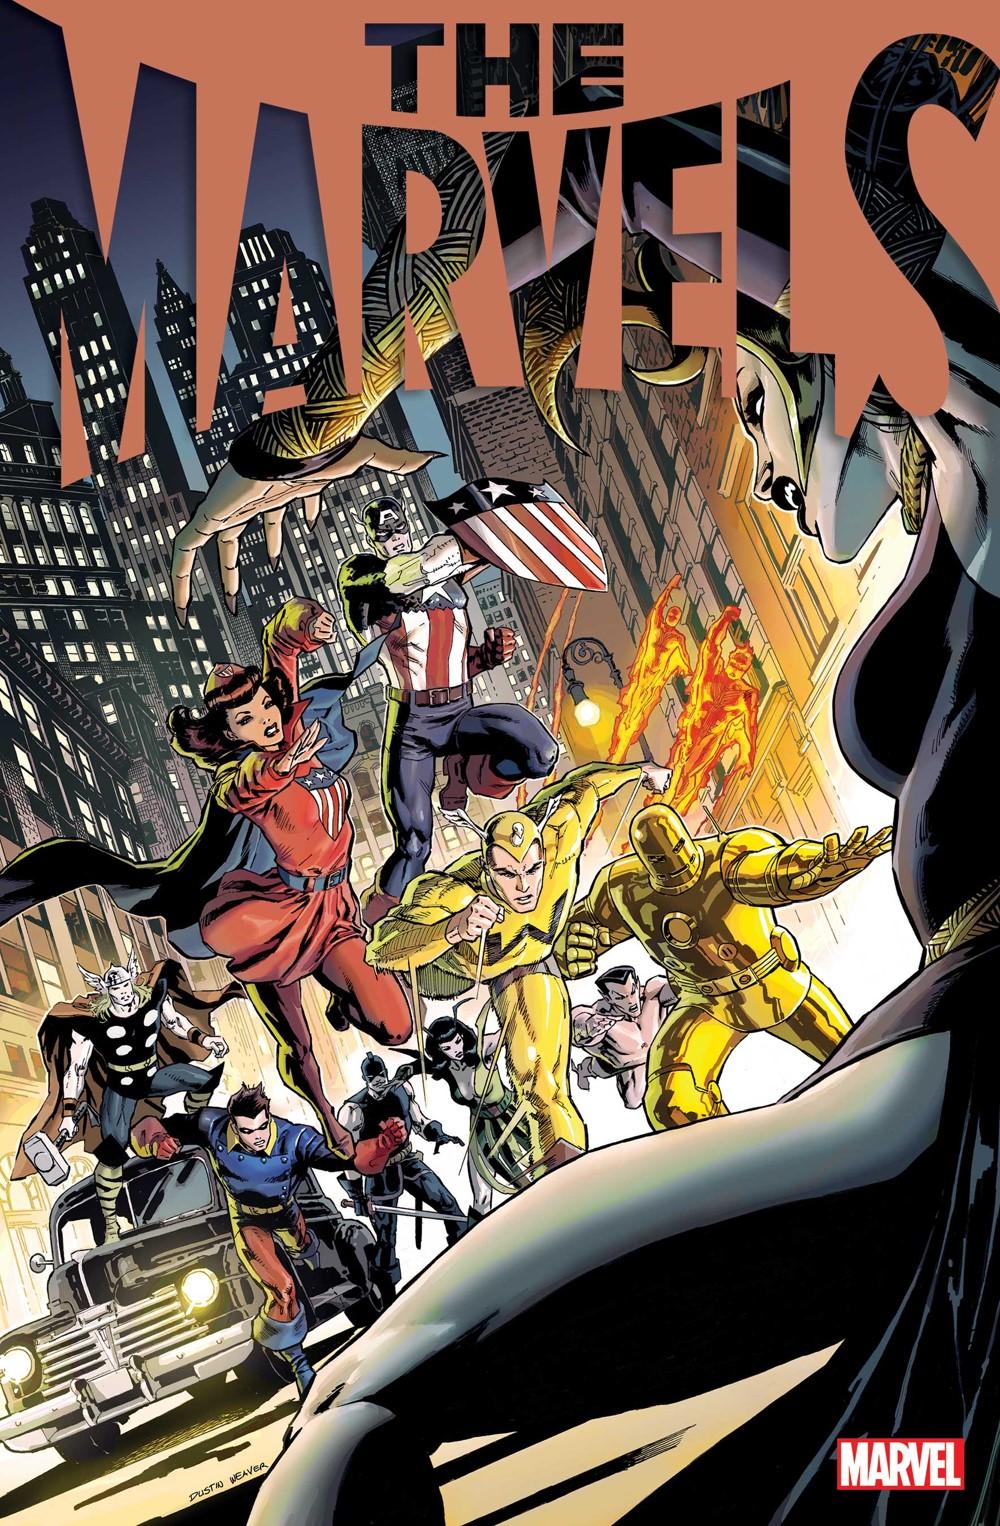 MAR2021006_Weaver_Var Marvel Comics October 2021 Solicitations